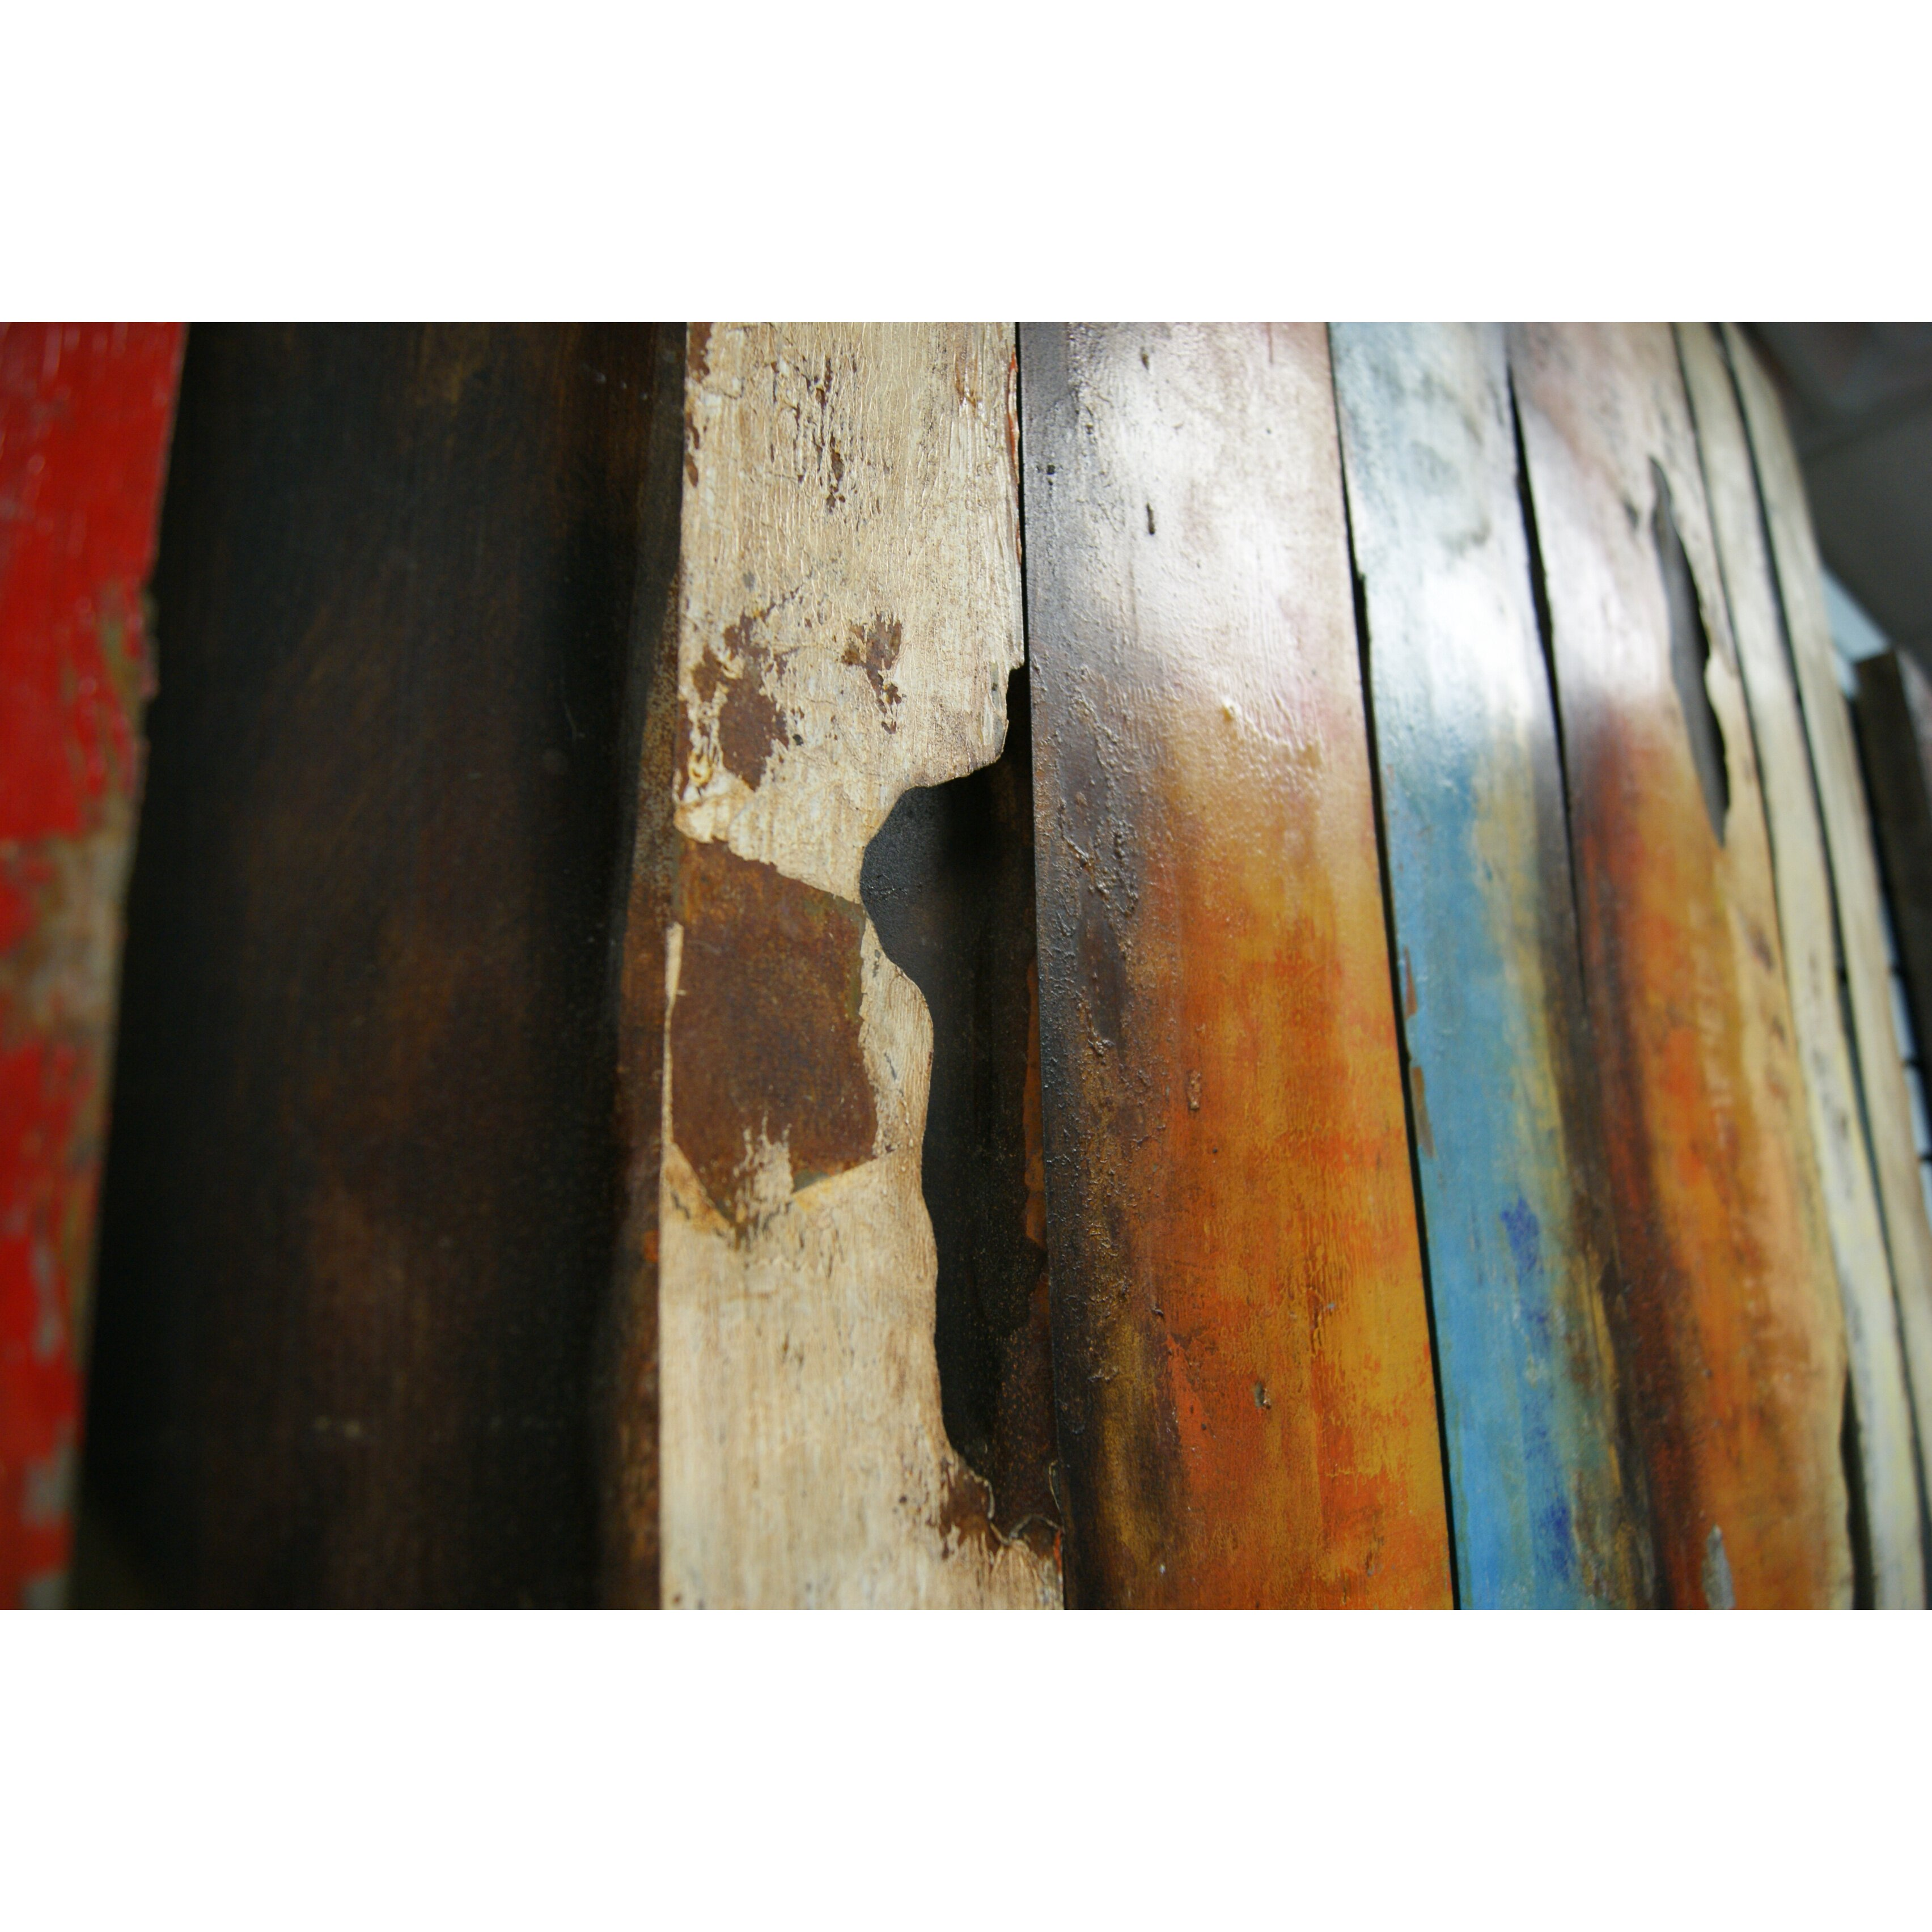 3d Metal Wall Panels : Hdc international d metal colorful panels wall décor